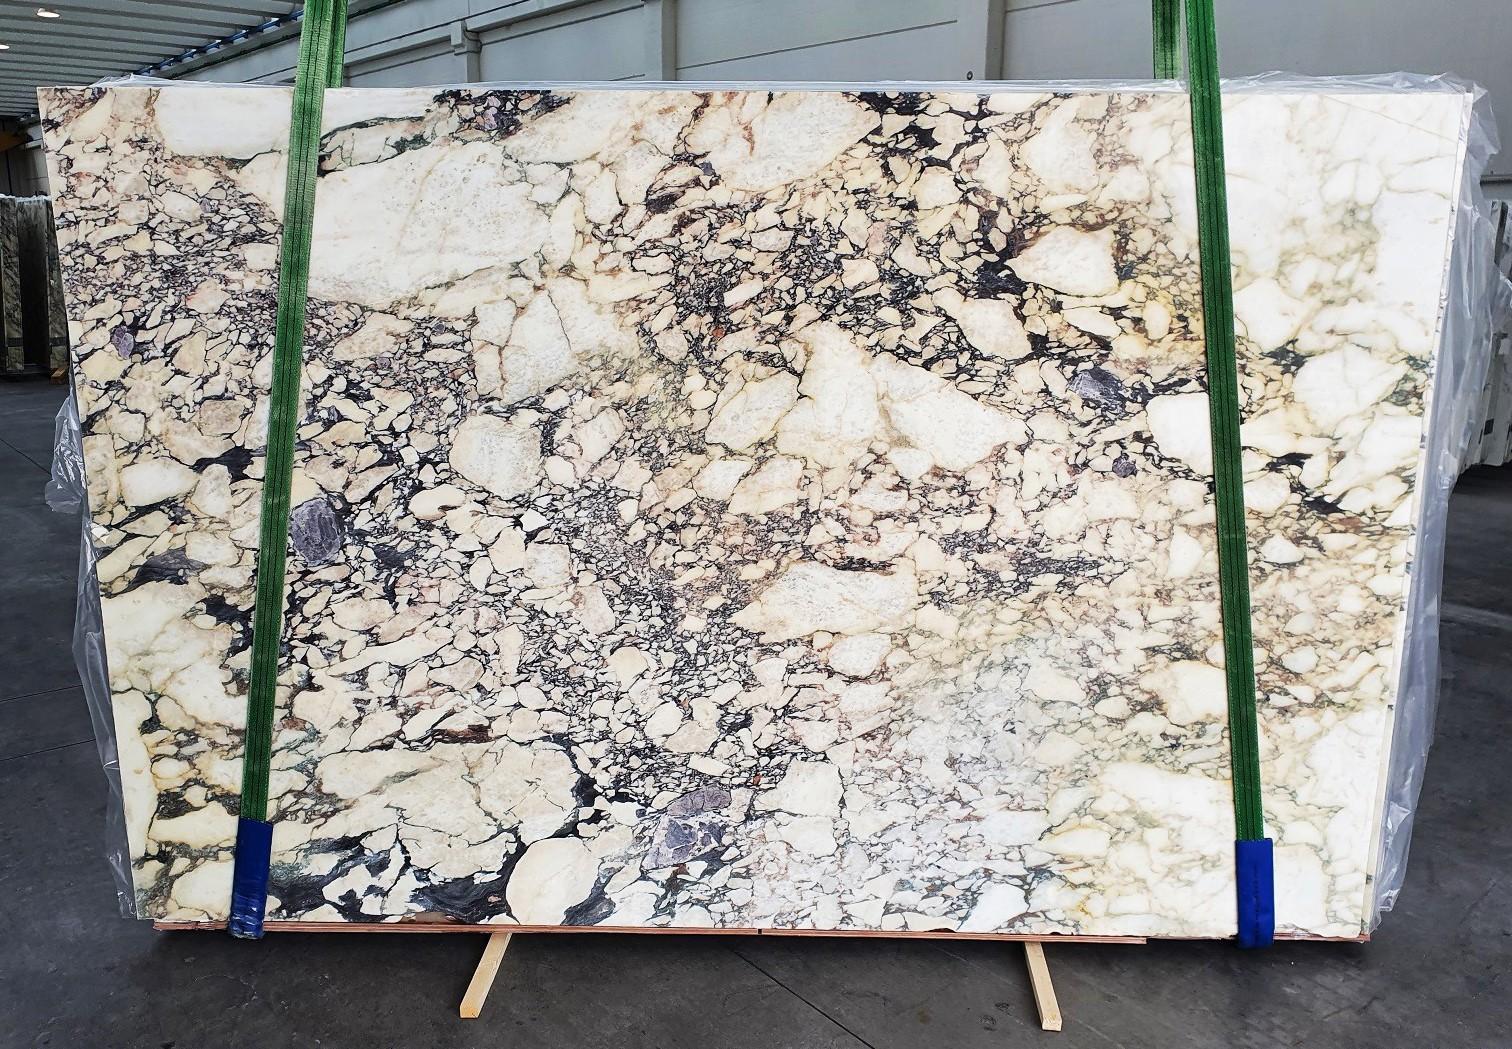 CALACATTA VIOLA Supply Veneto (Italy) polished slabs 1291 , Slab #51 natural marble